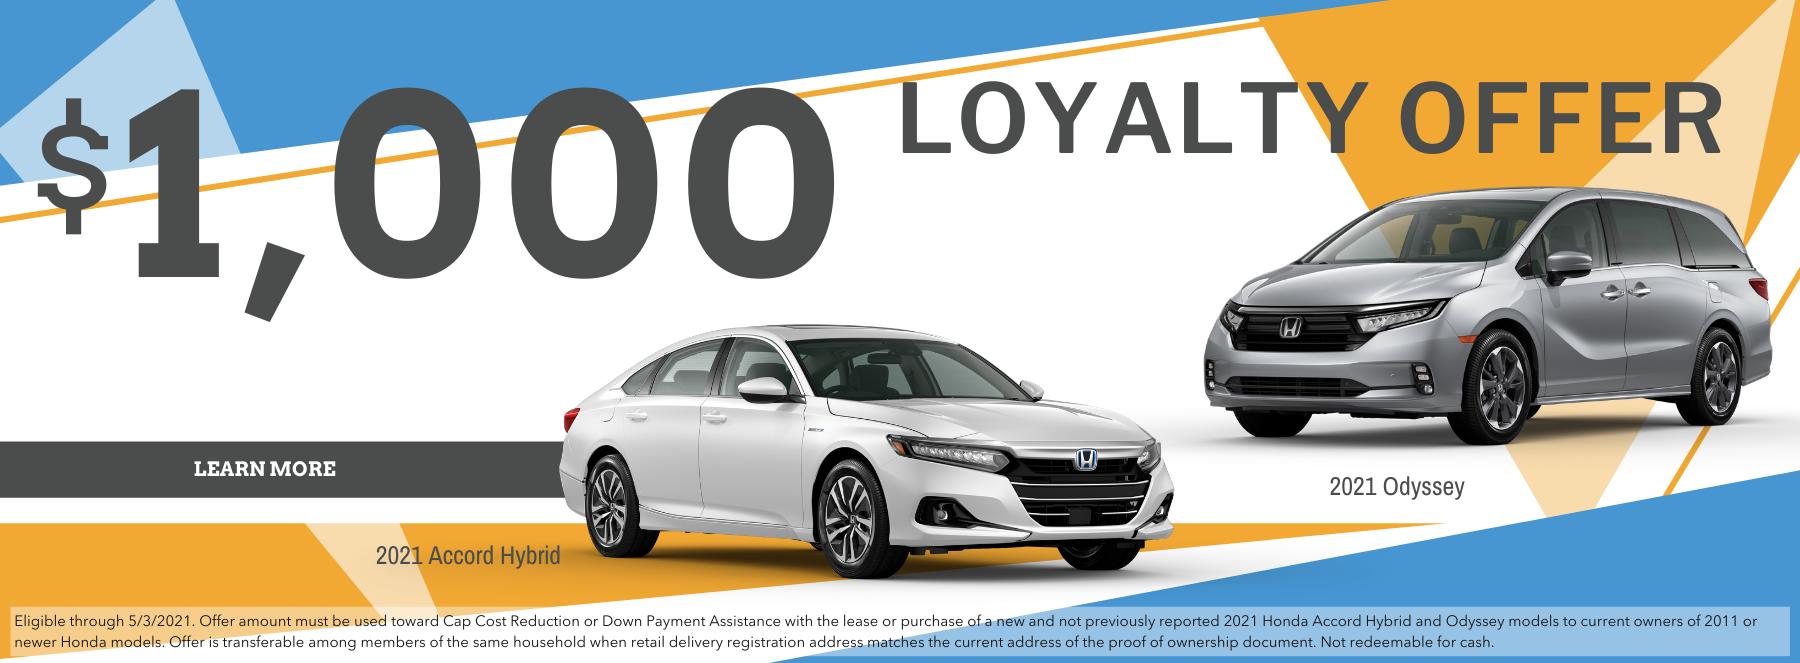 Honda Loyalty offers 1000